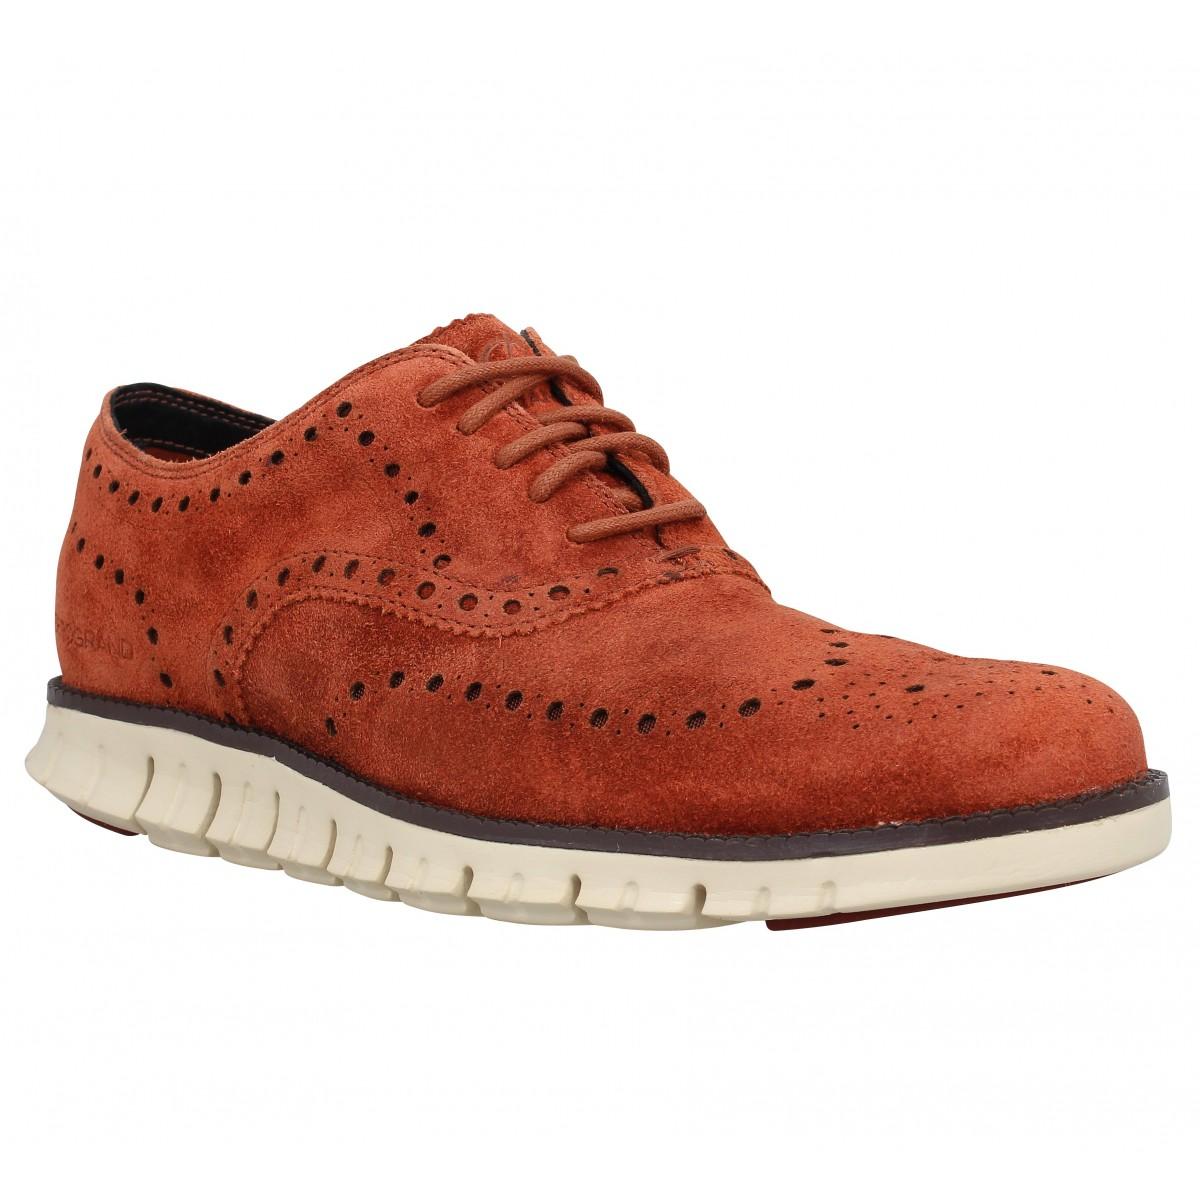 Chaussures à lacets COLE HAAN Zerogrand Wingtip Oxford velours Homme Marron